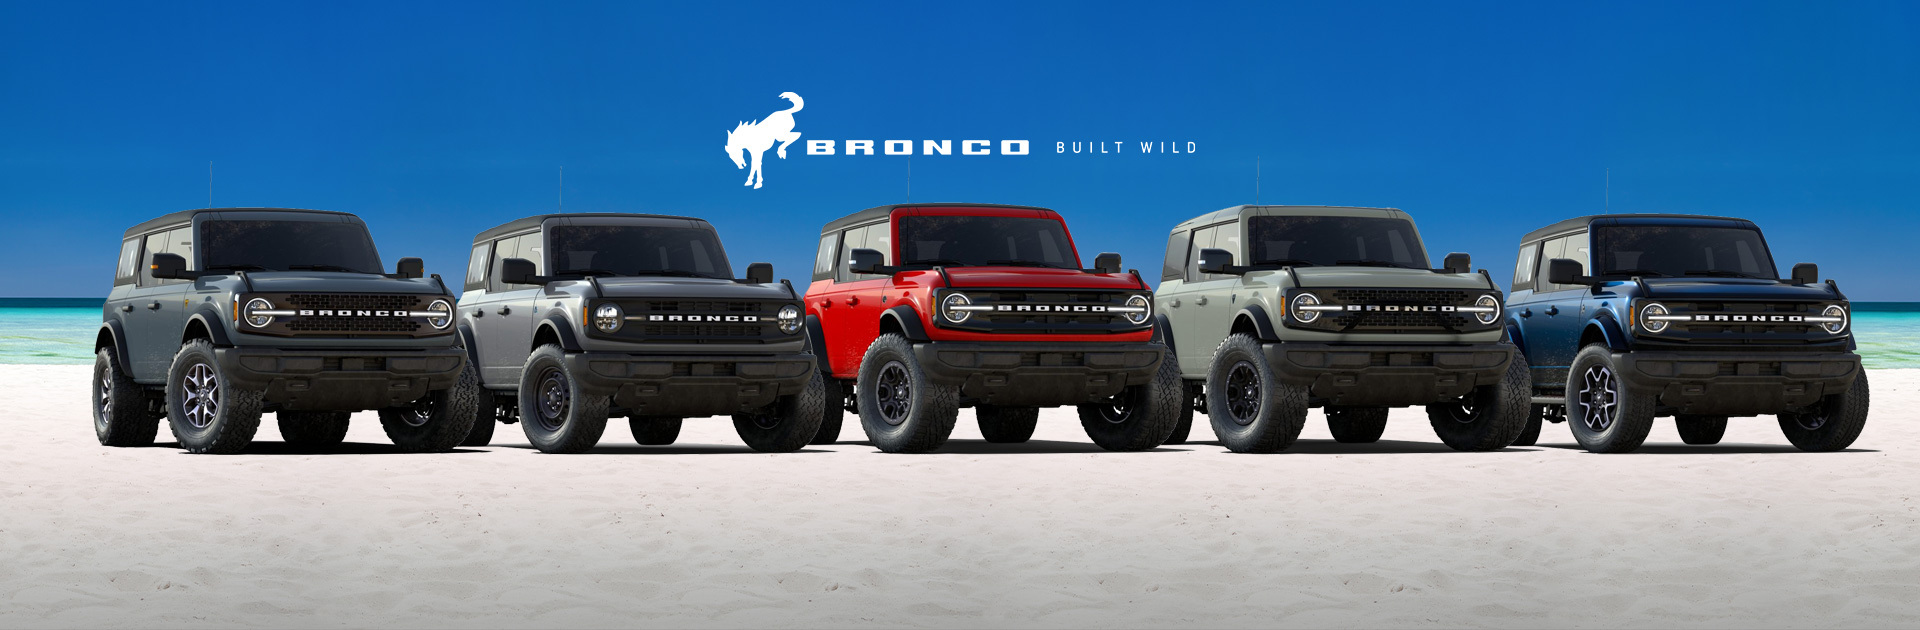 Rnf Bronco Hero1